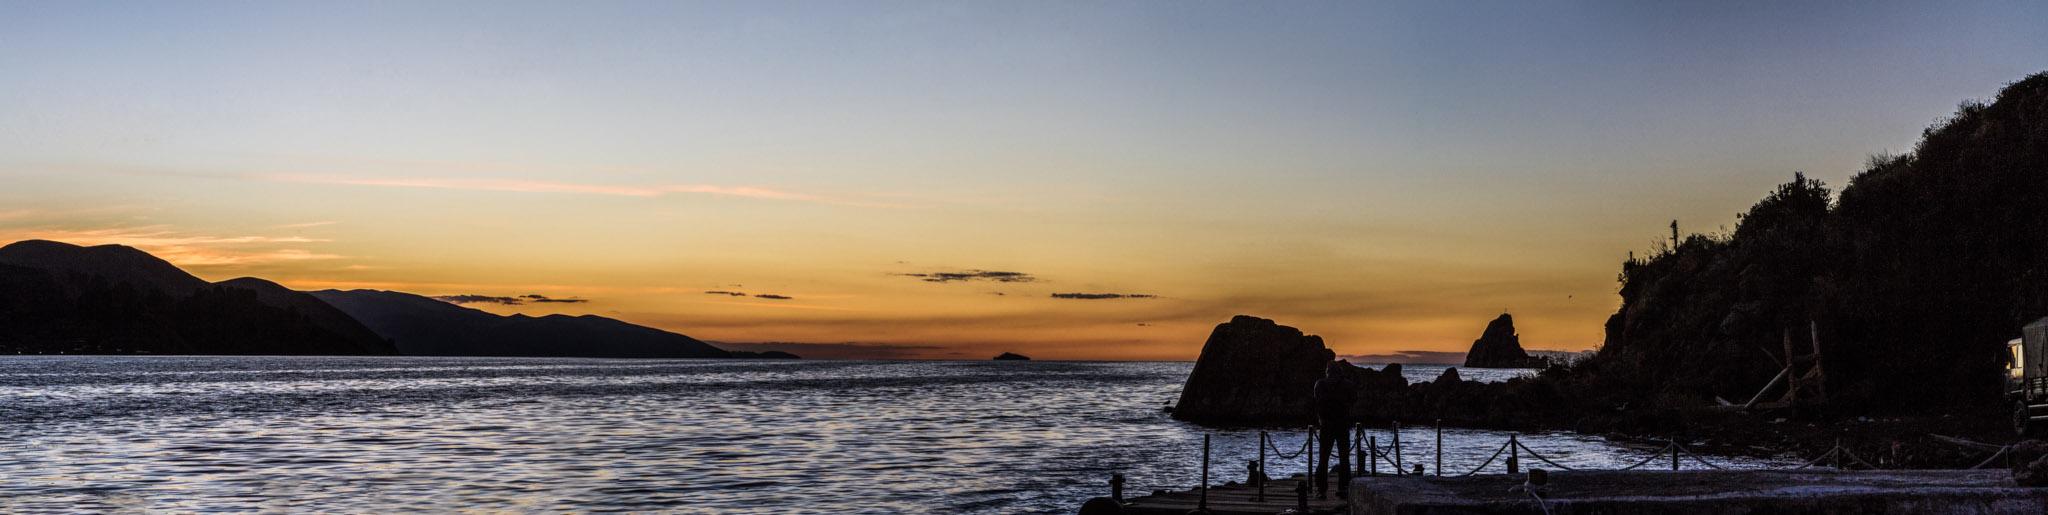 Ali-Barqawi-Studios-Explore-Series-Travel-Adventure-Documentary-C4CGAZA-Bolivia-Lake-Titicaca-2015-023.jpg